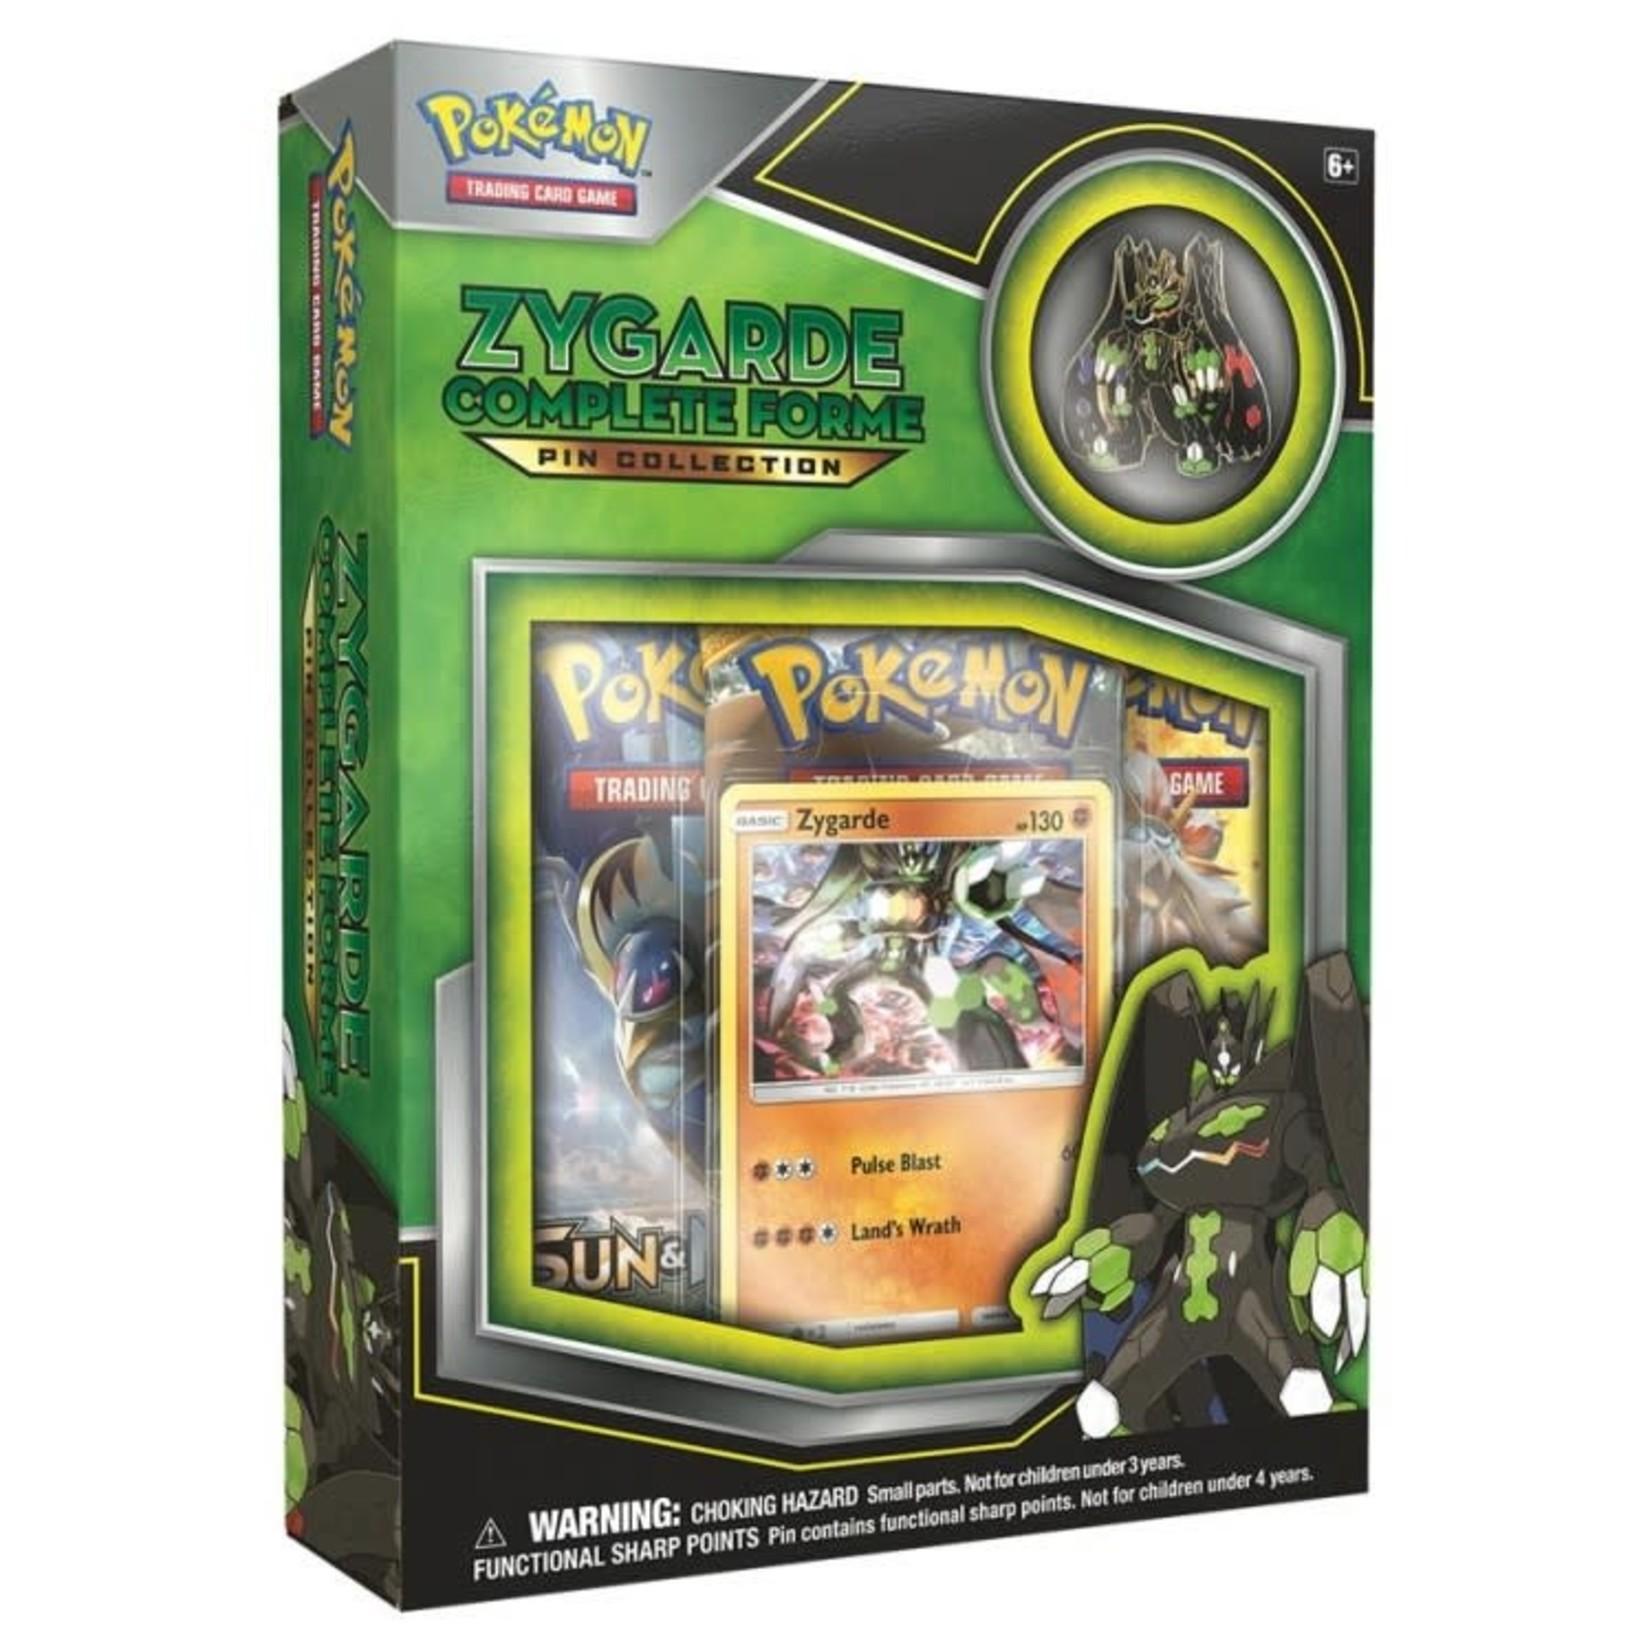 Pokemon International Pokemon Trading Card Game: Zygarde Complete Collection Box